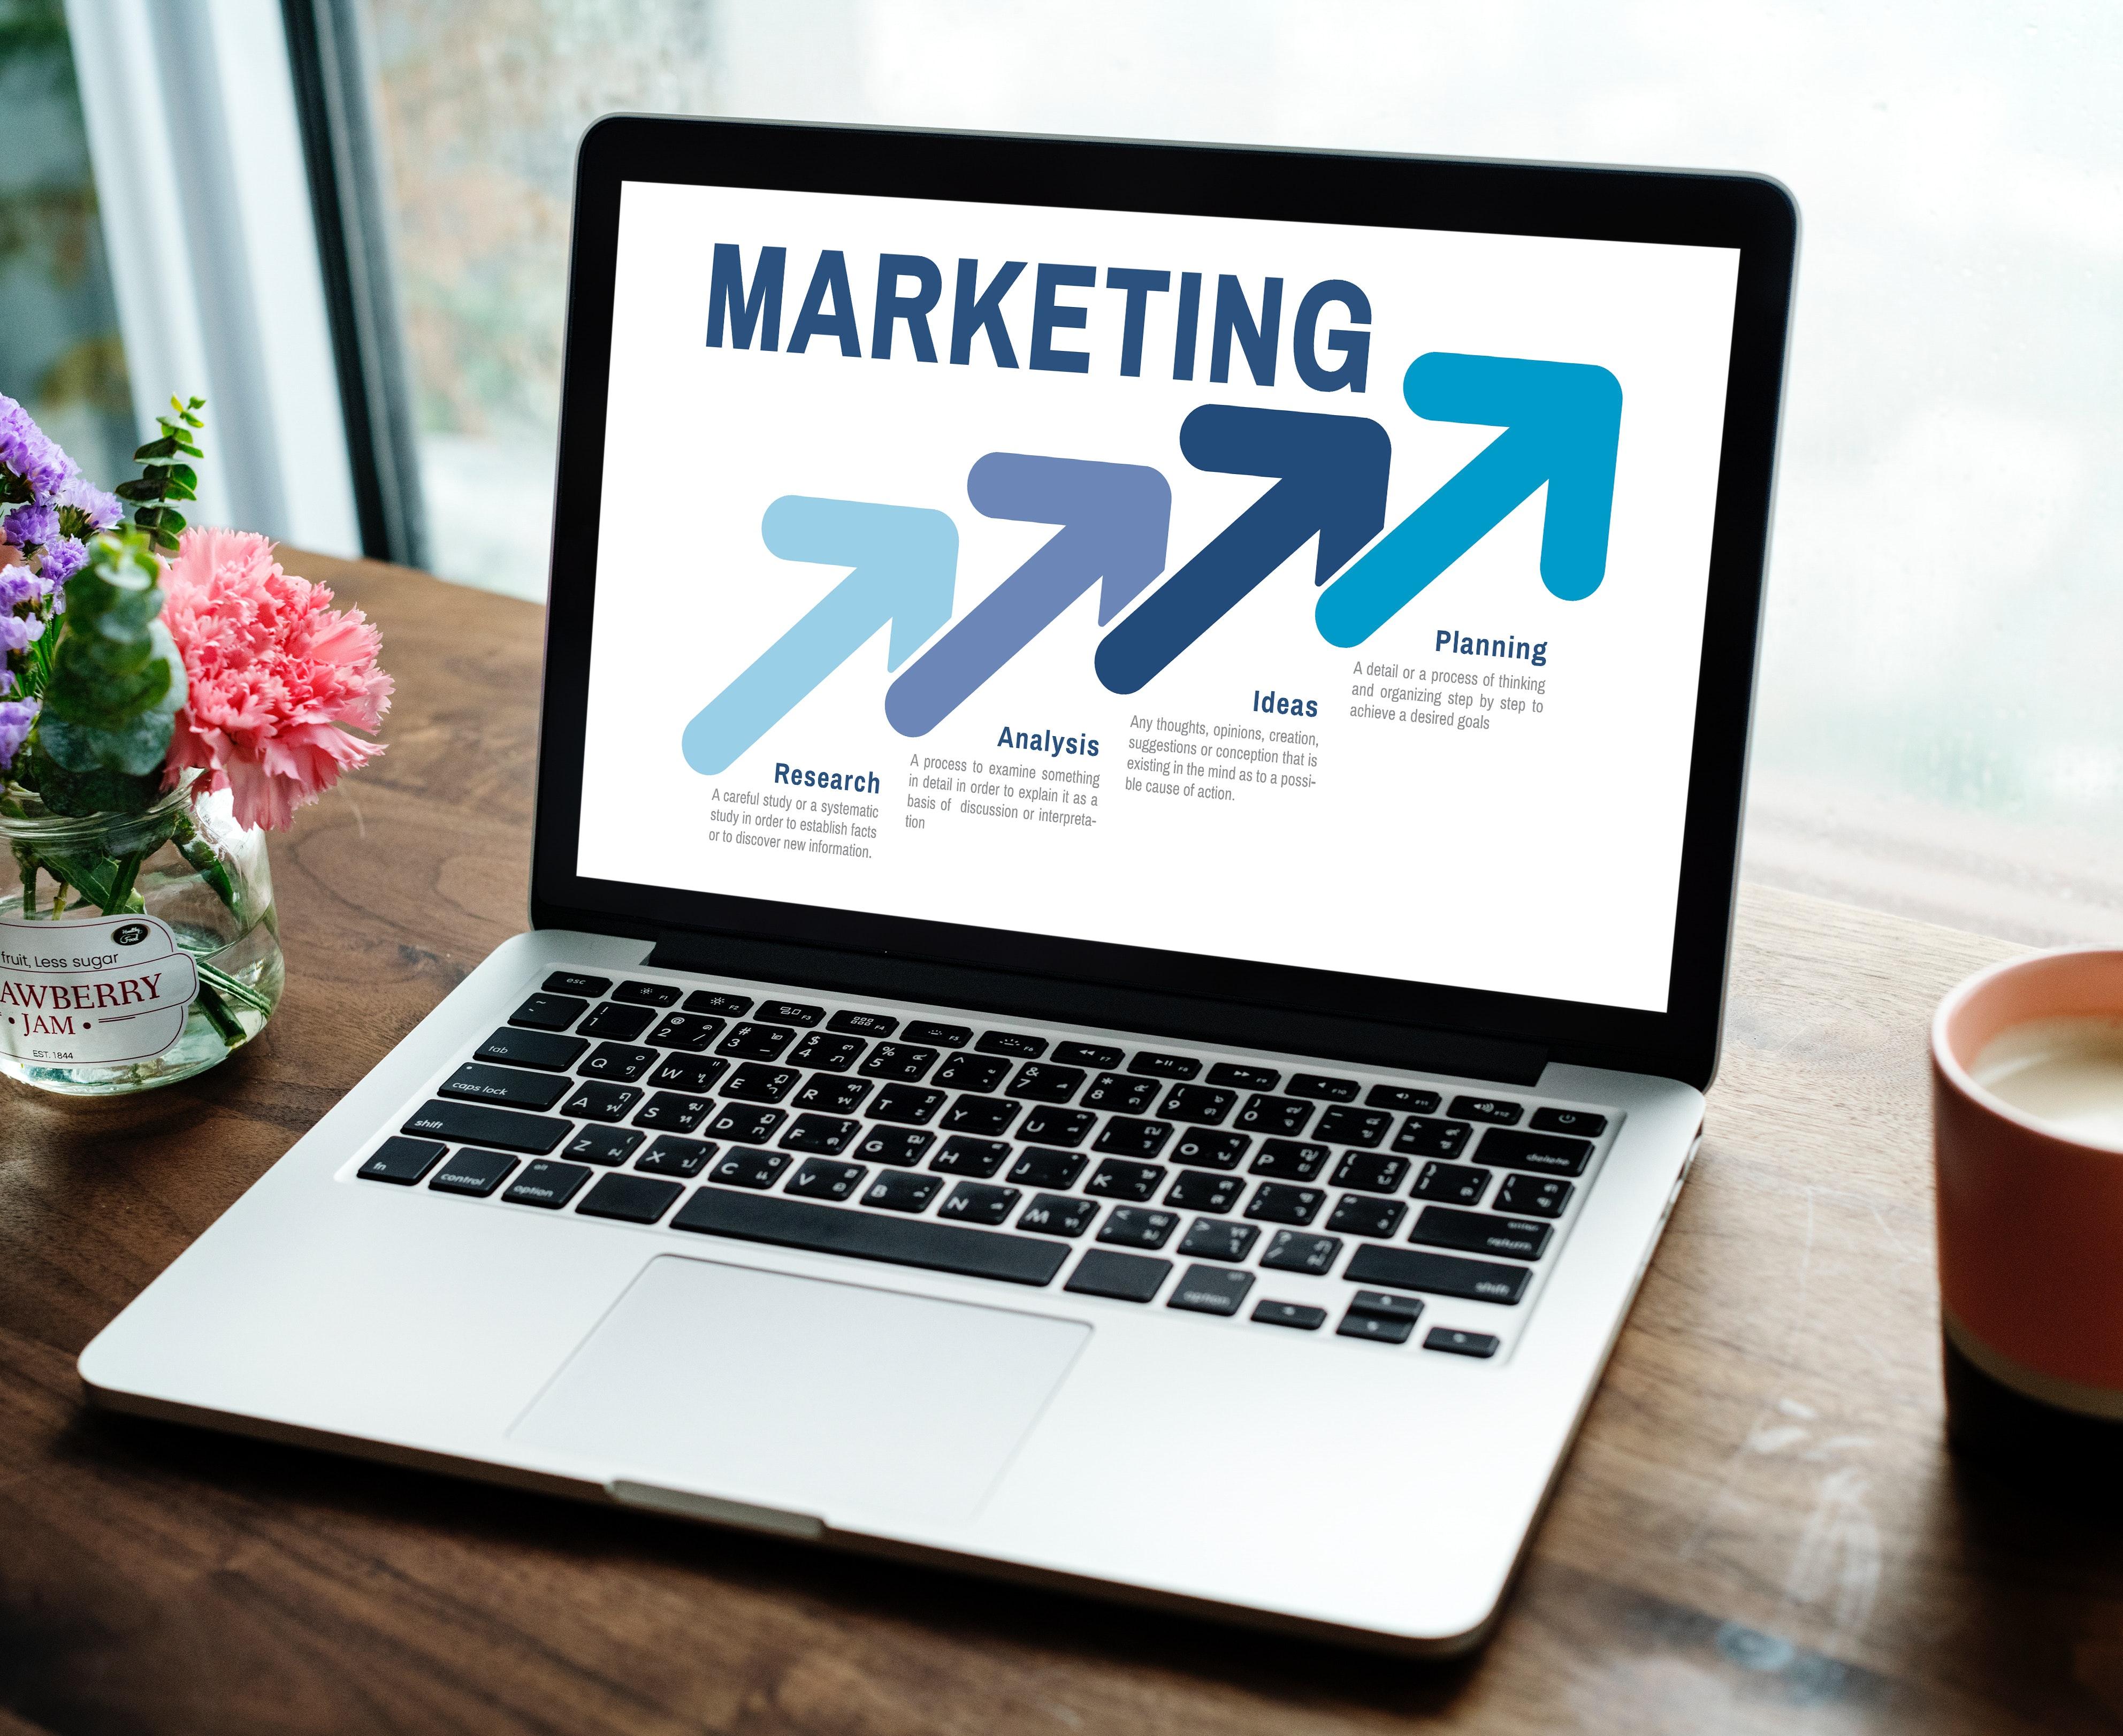 "<img alt=""steps of marketing"">"